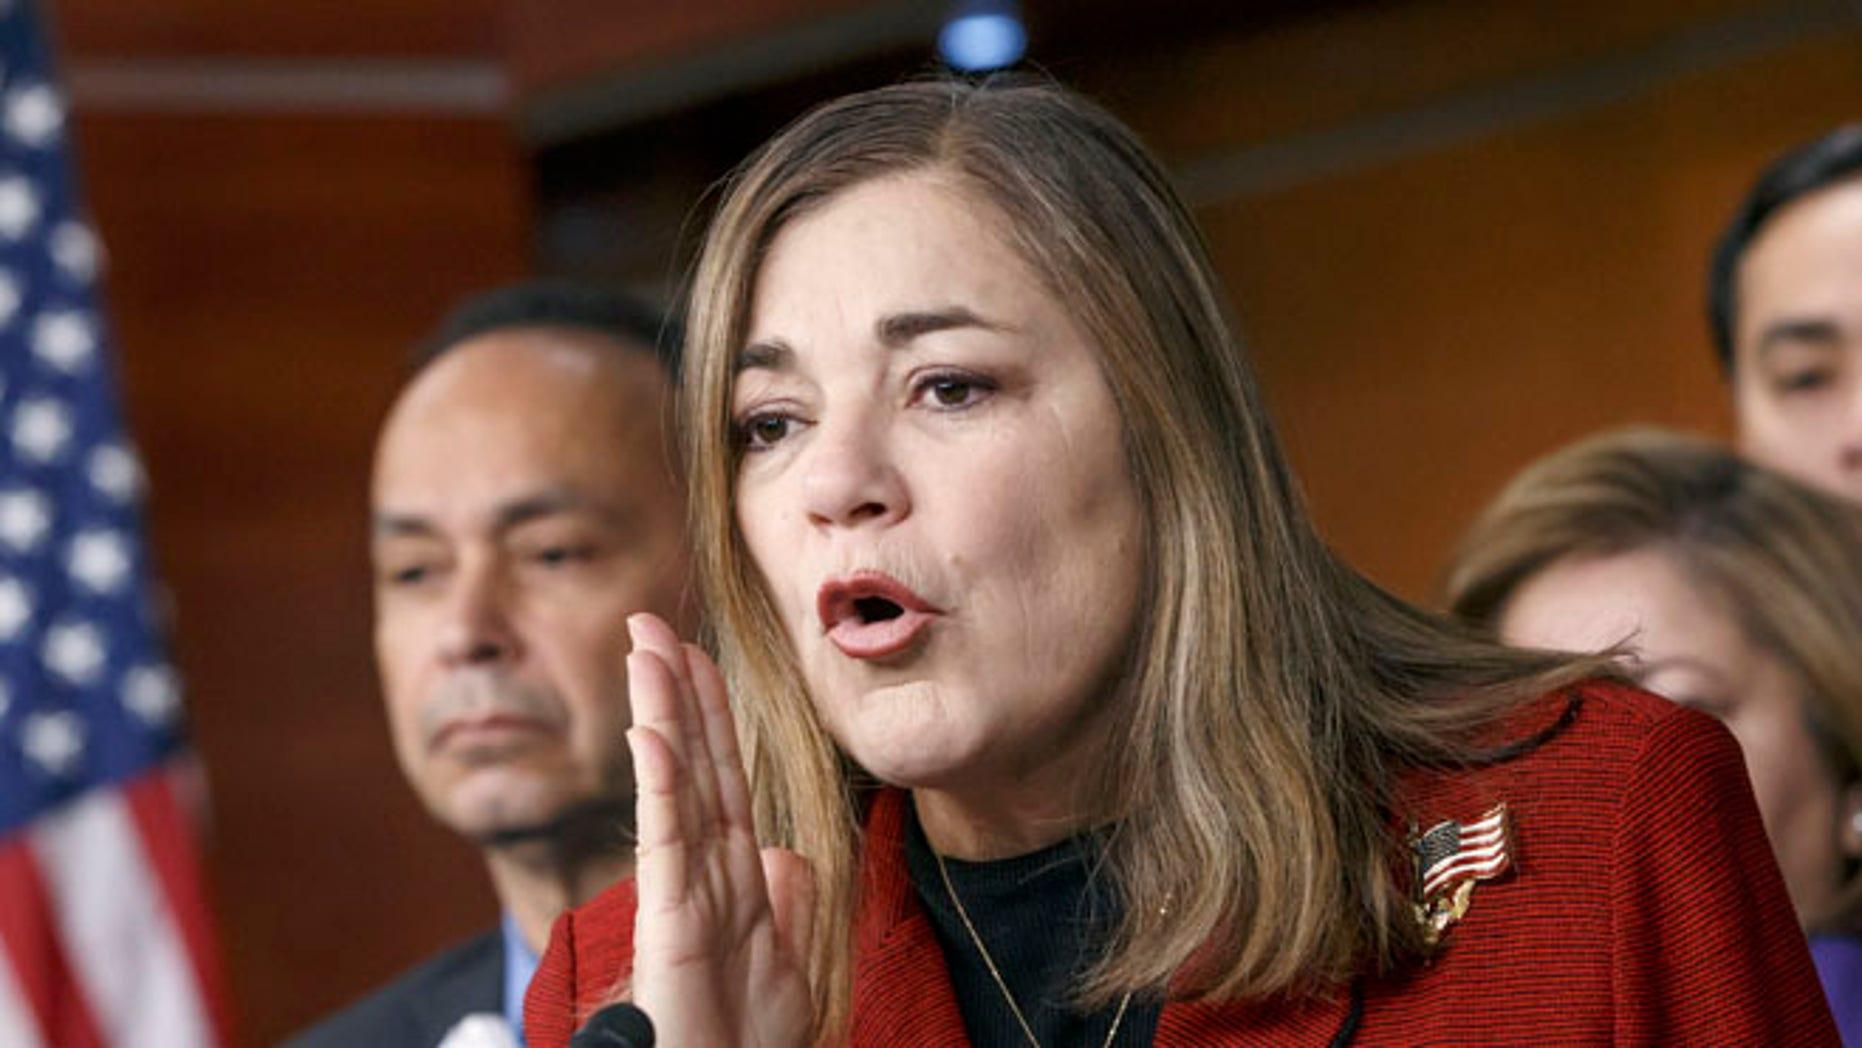 FILE: Feb. 13, 2015: Rep. Loretta Sanchez, D-Calif., at a Congressional Hispanic Caucus news conference on Capitol Hill in Washington, D.C. (AP)